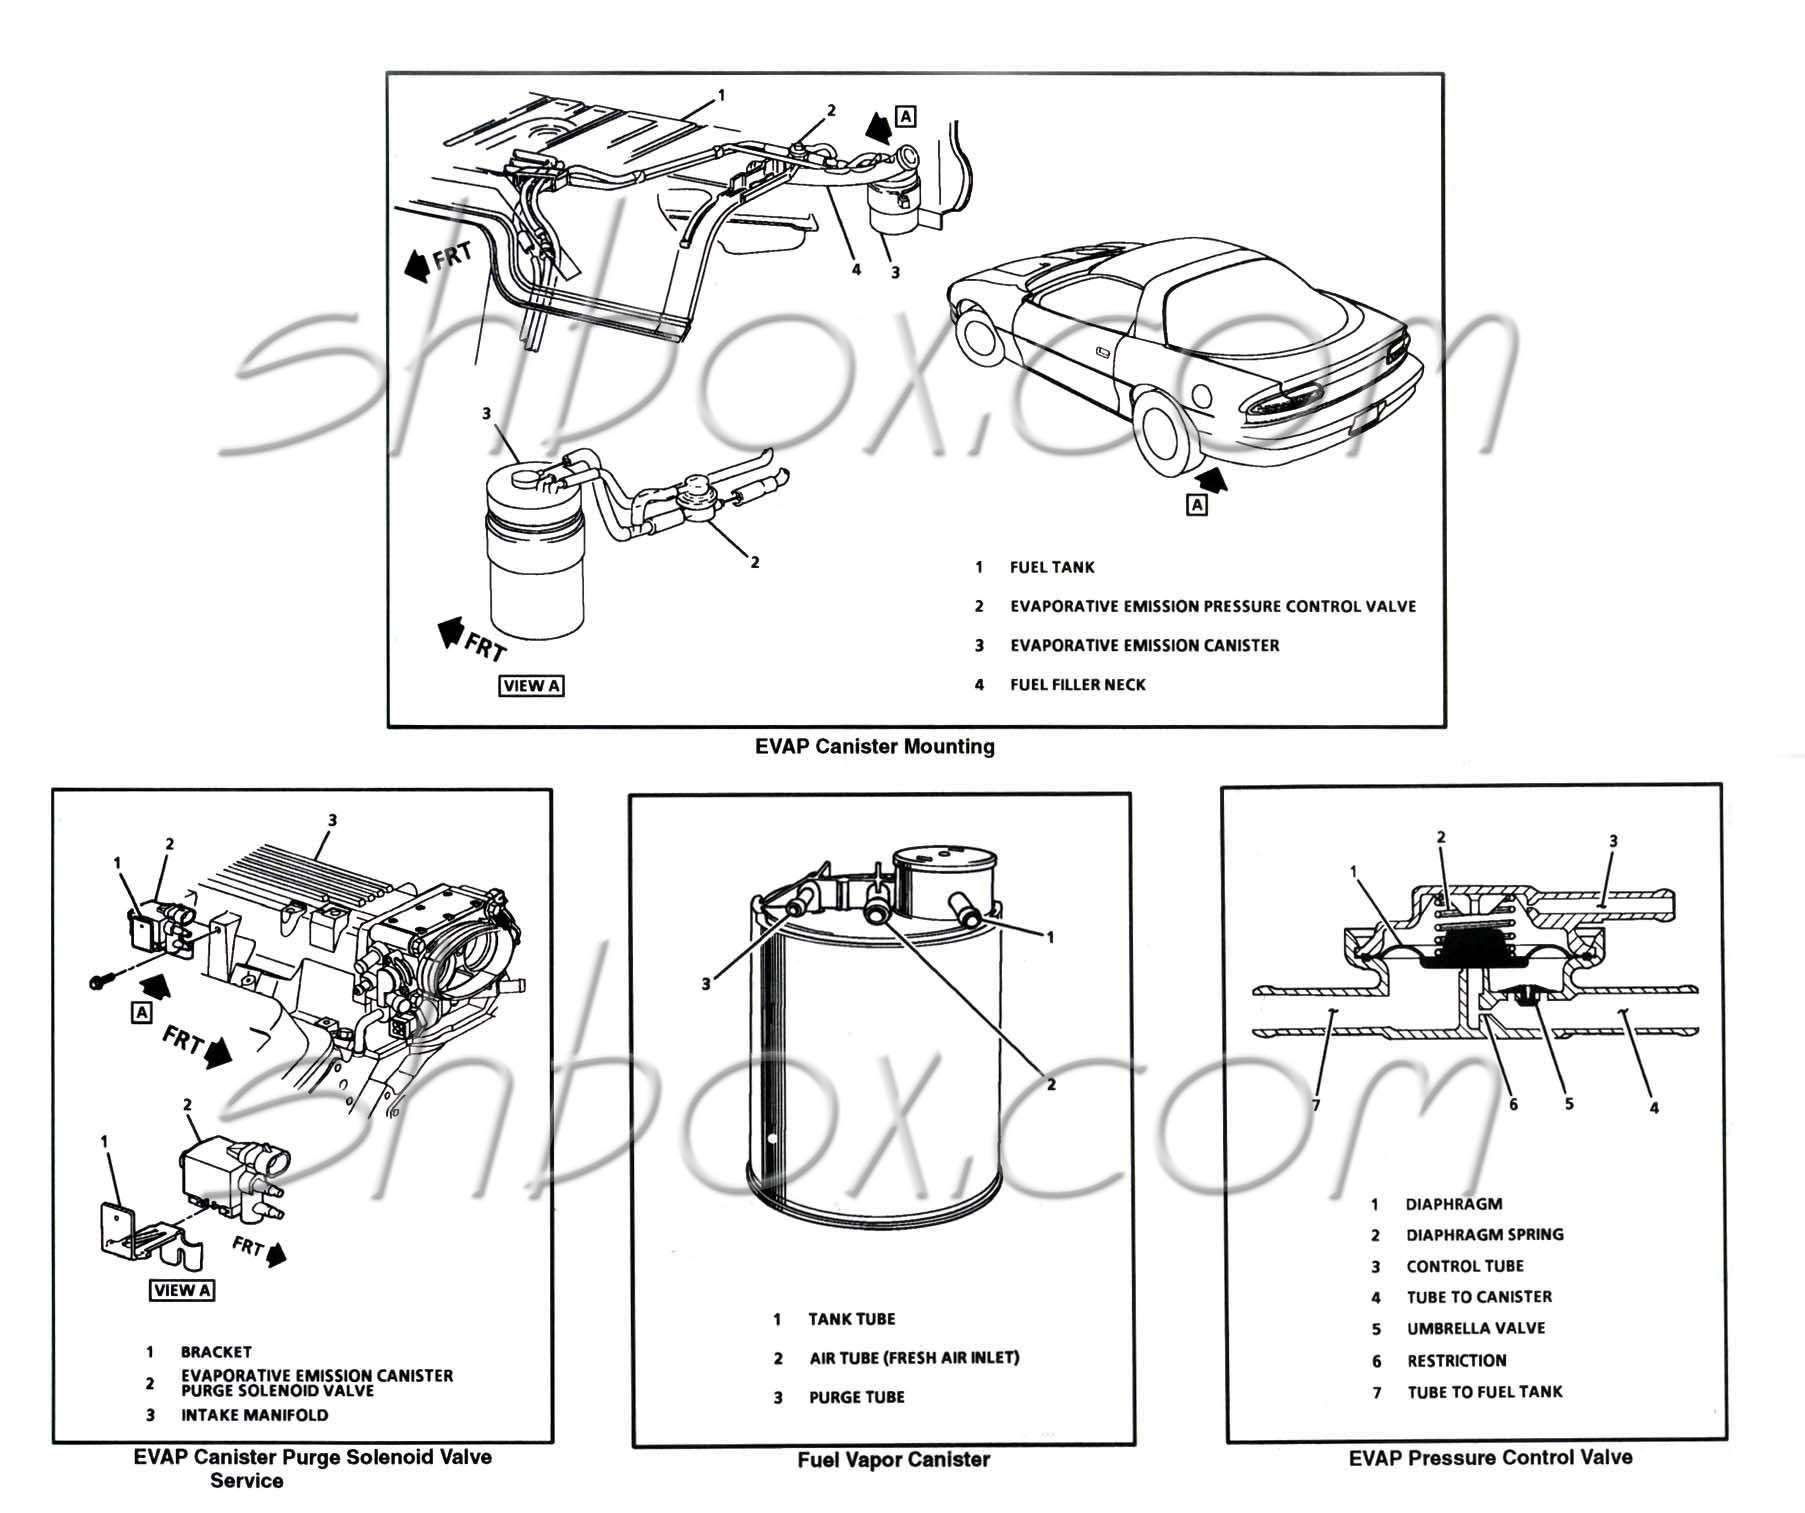 1997 EVAP Diagram Needed - LS1TECH - Camaro and Firebird ...